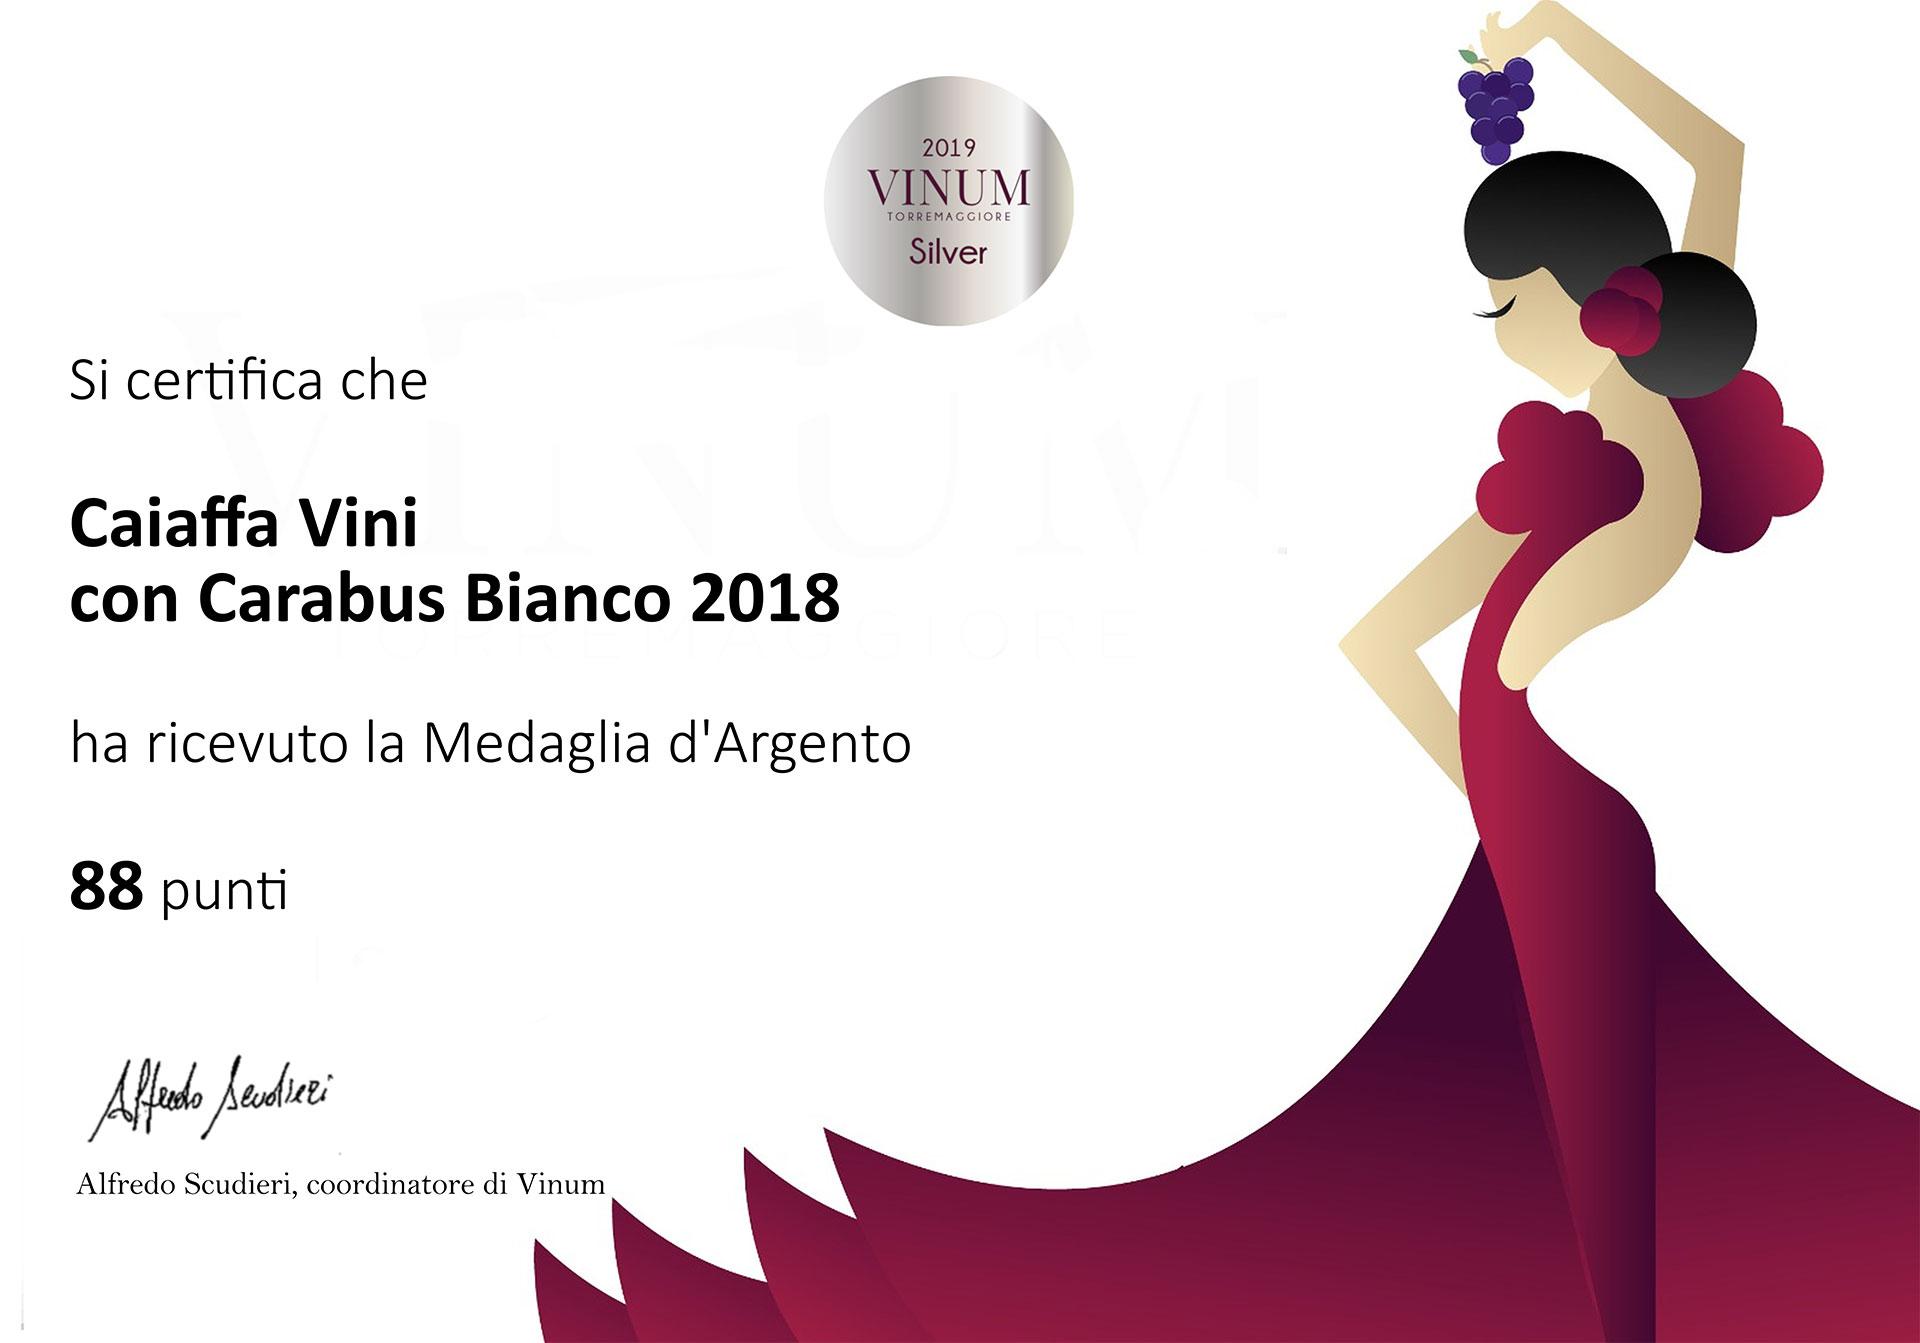 caiaffa-vini-medaglia-argento-vinum(1)